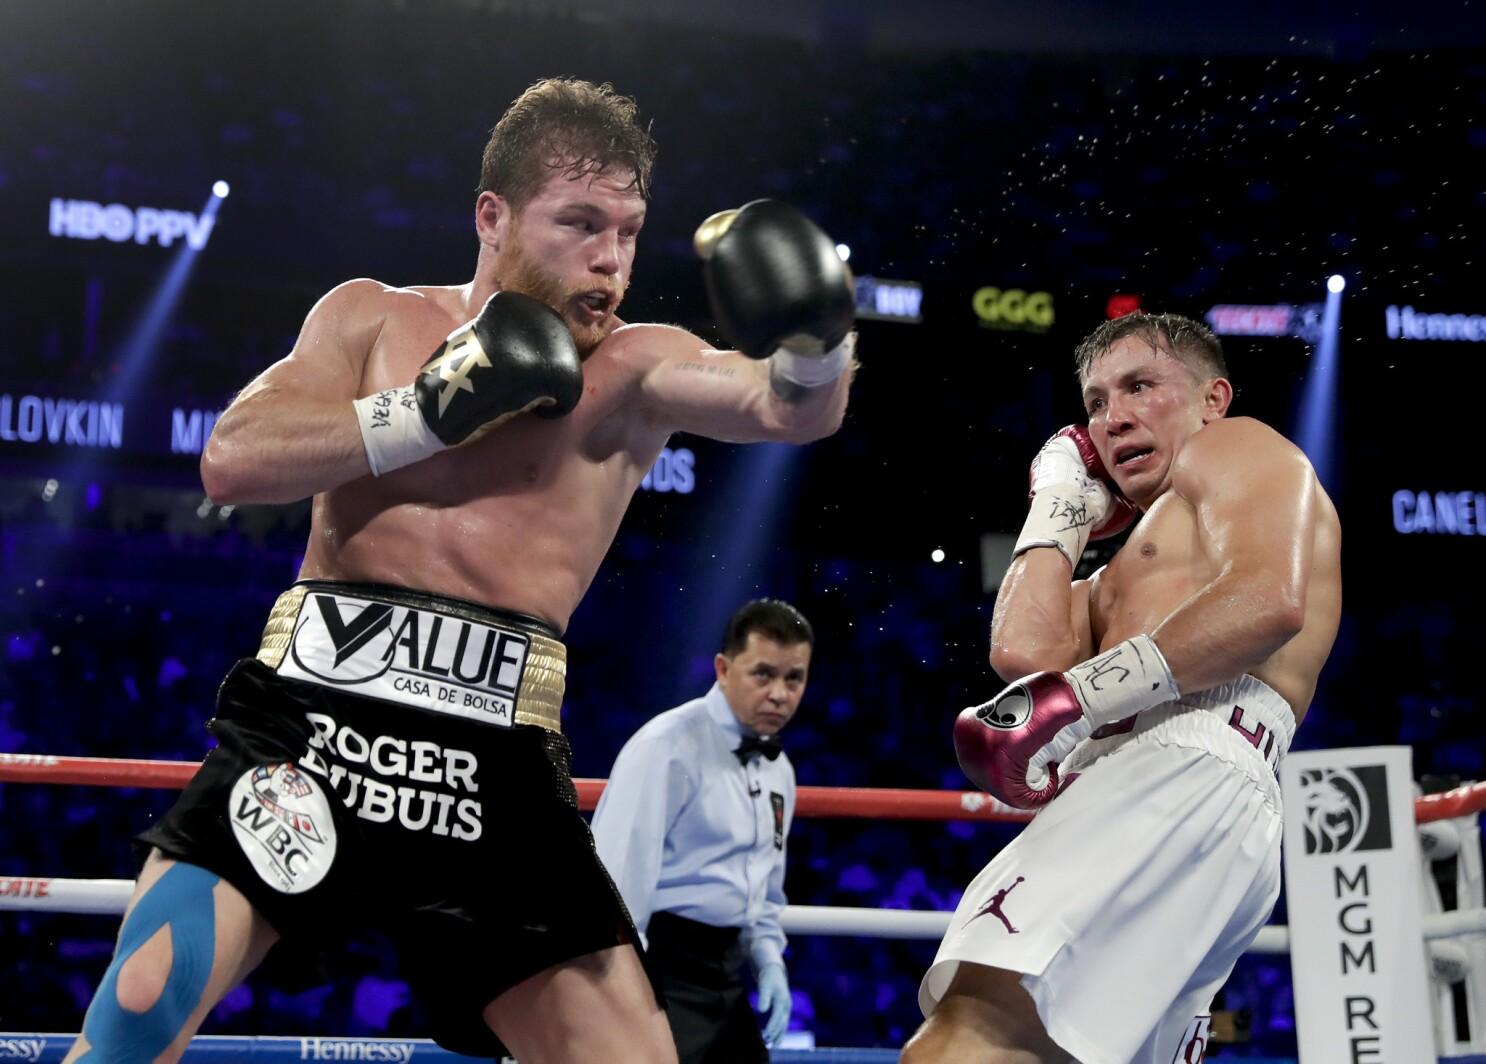 Canelo-GGG Rematch: Alvarez beats Golovkin by majority